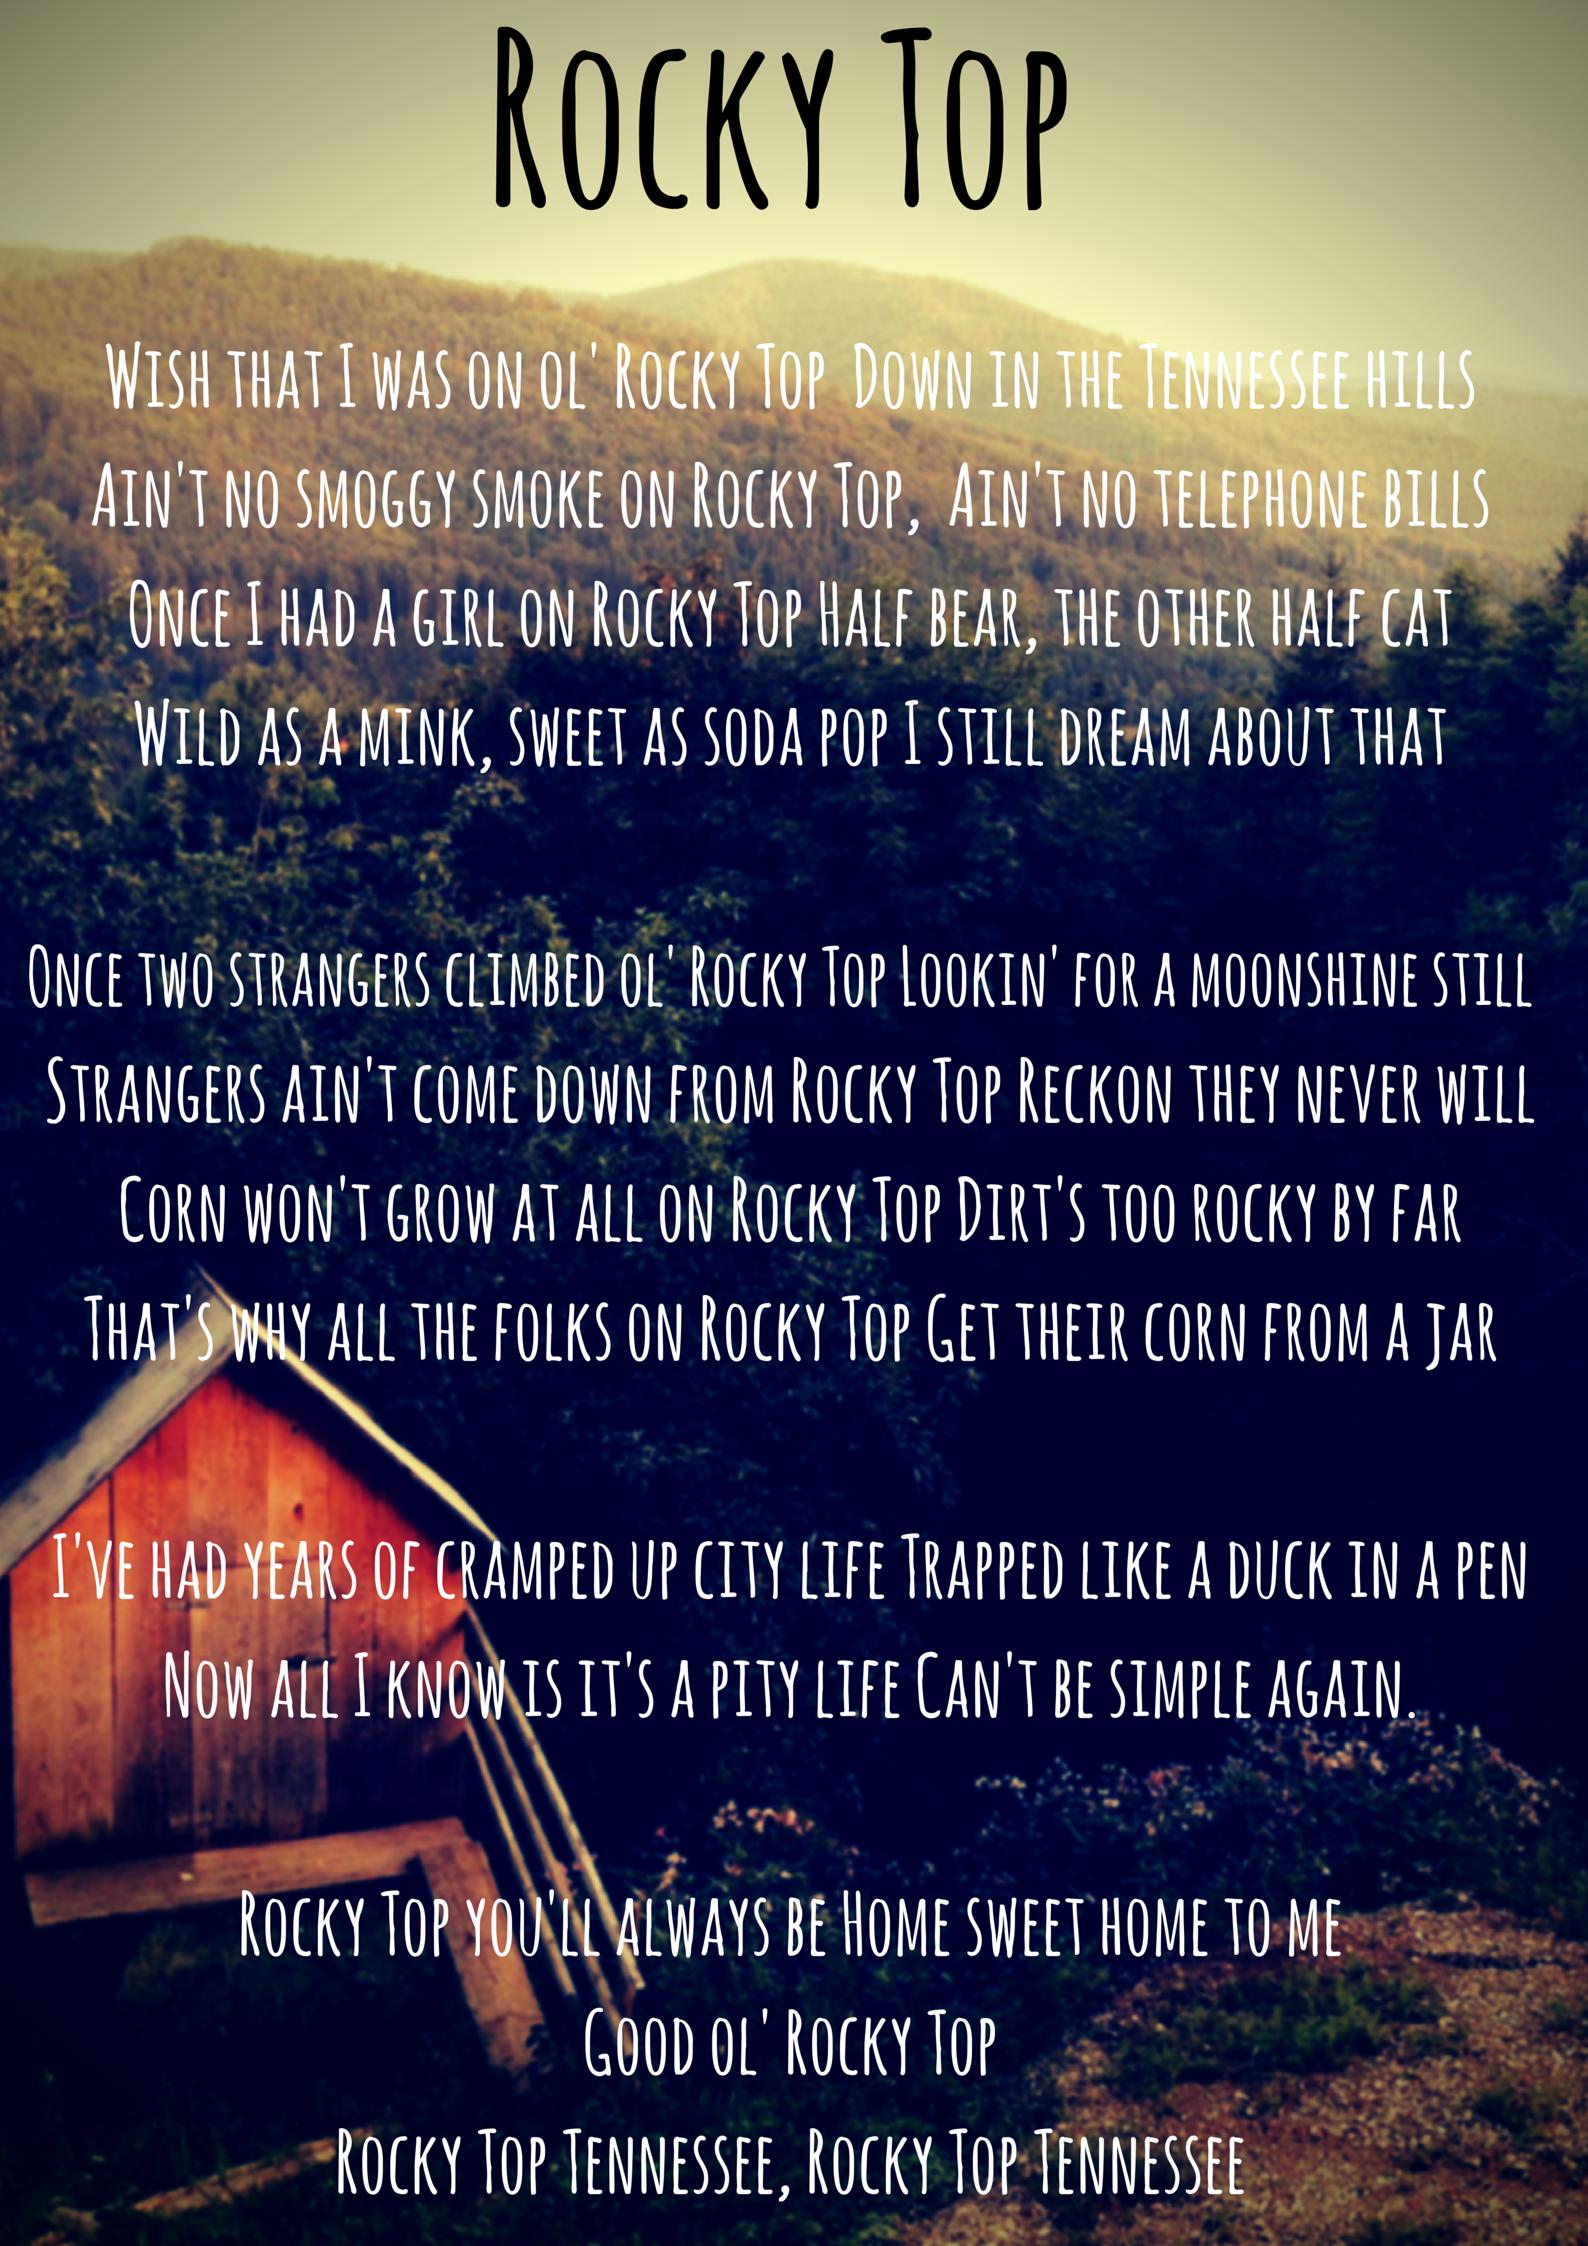 Rockytop Tennessee Lyrics Song Easttn Tn Smokies Rocky Top Rocky Top Tennessee Tennessee